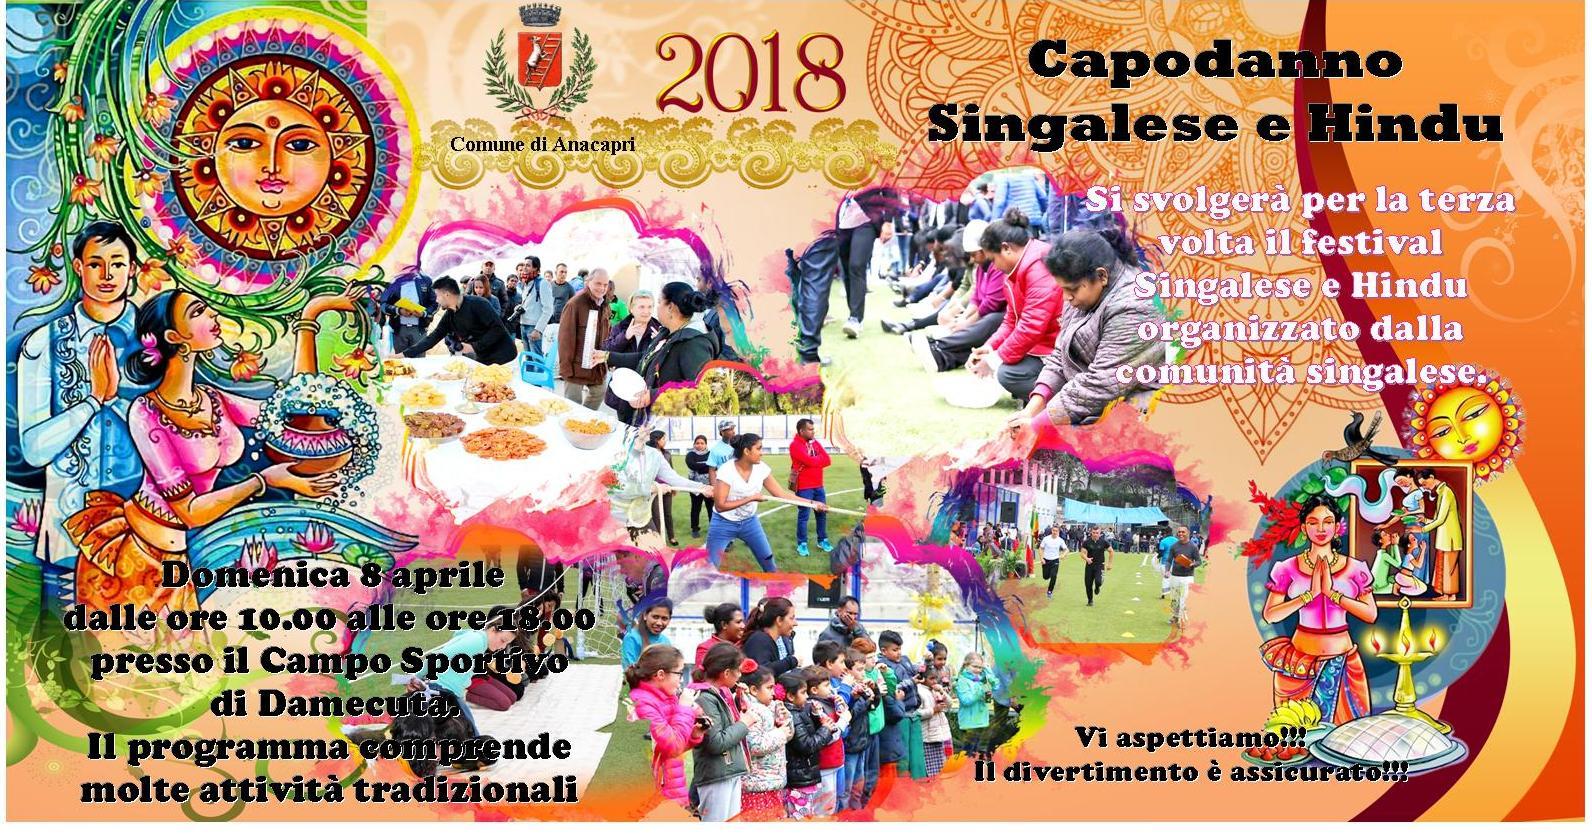 Capodanno Singalese